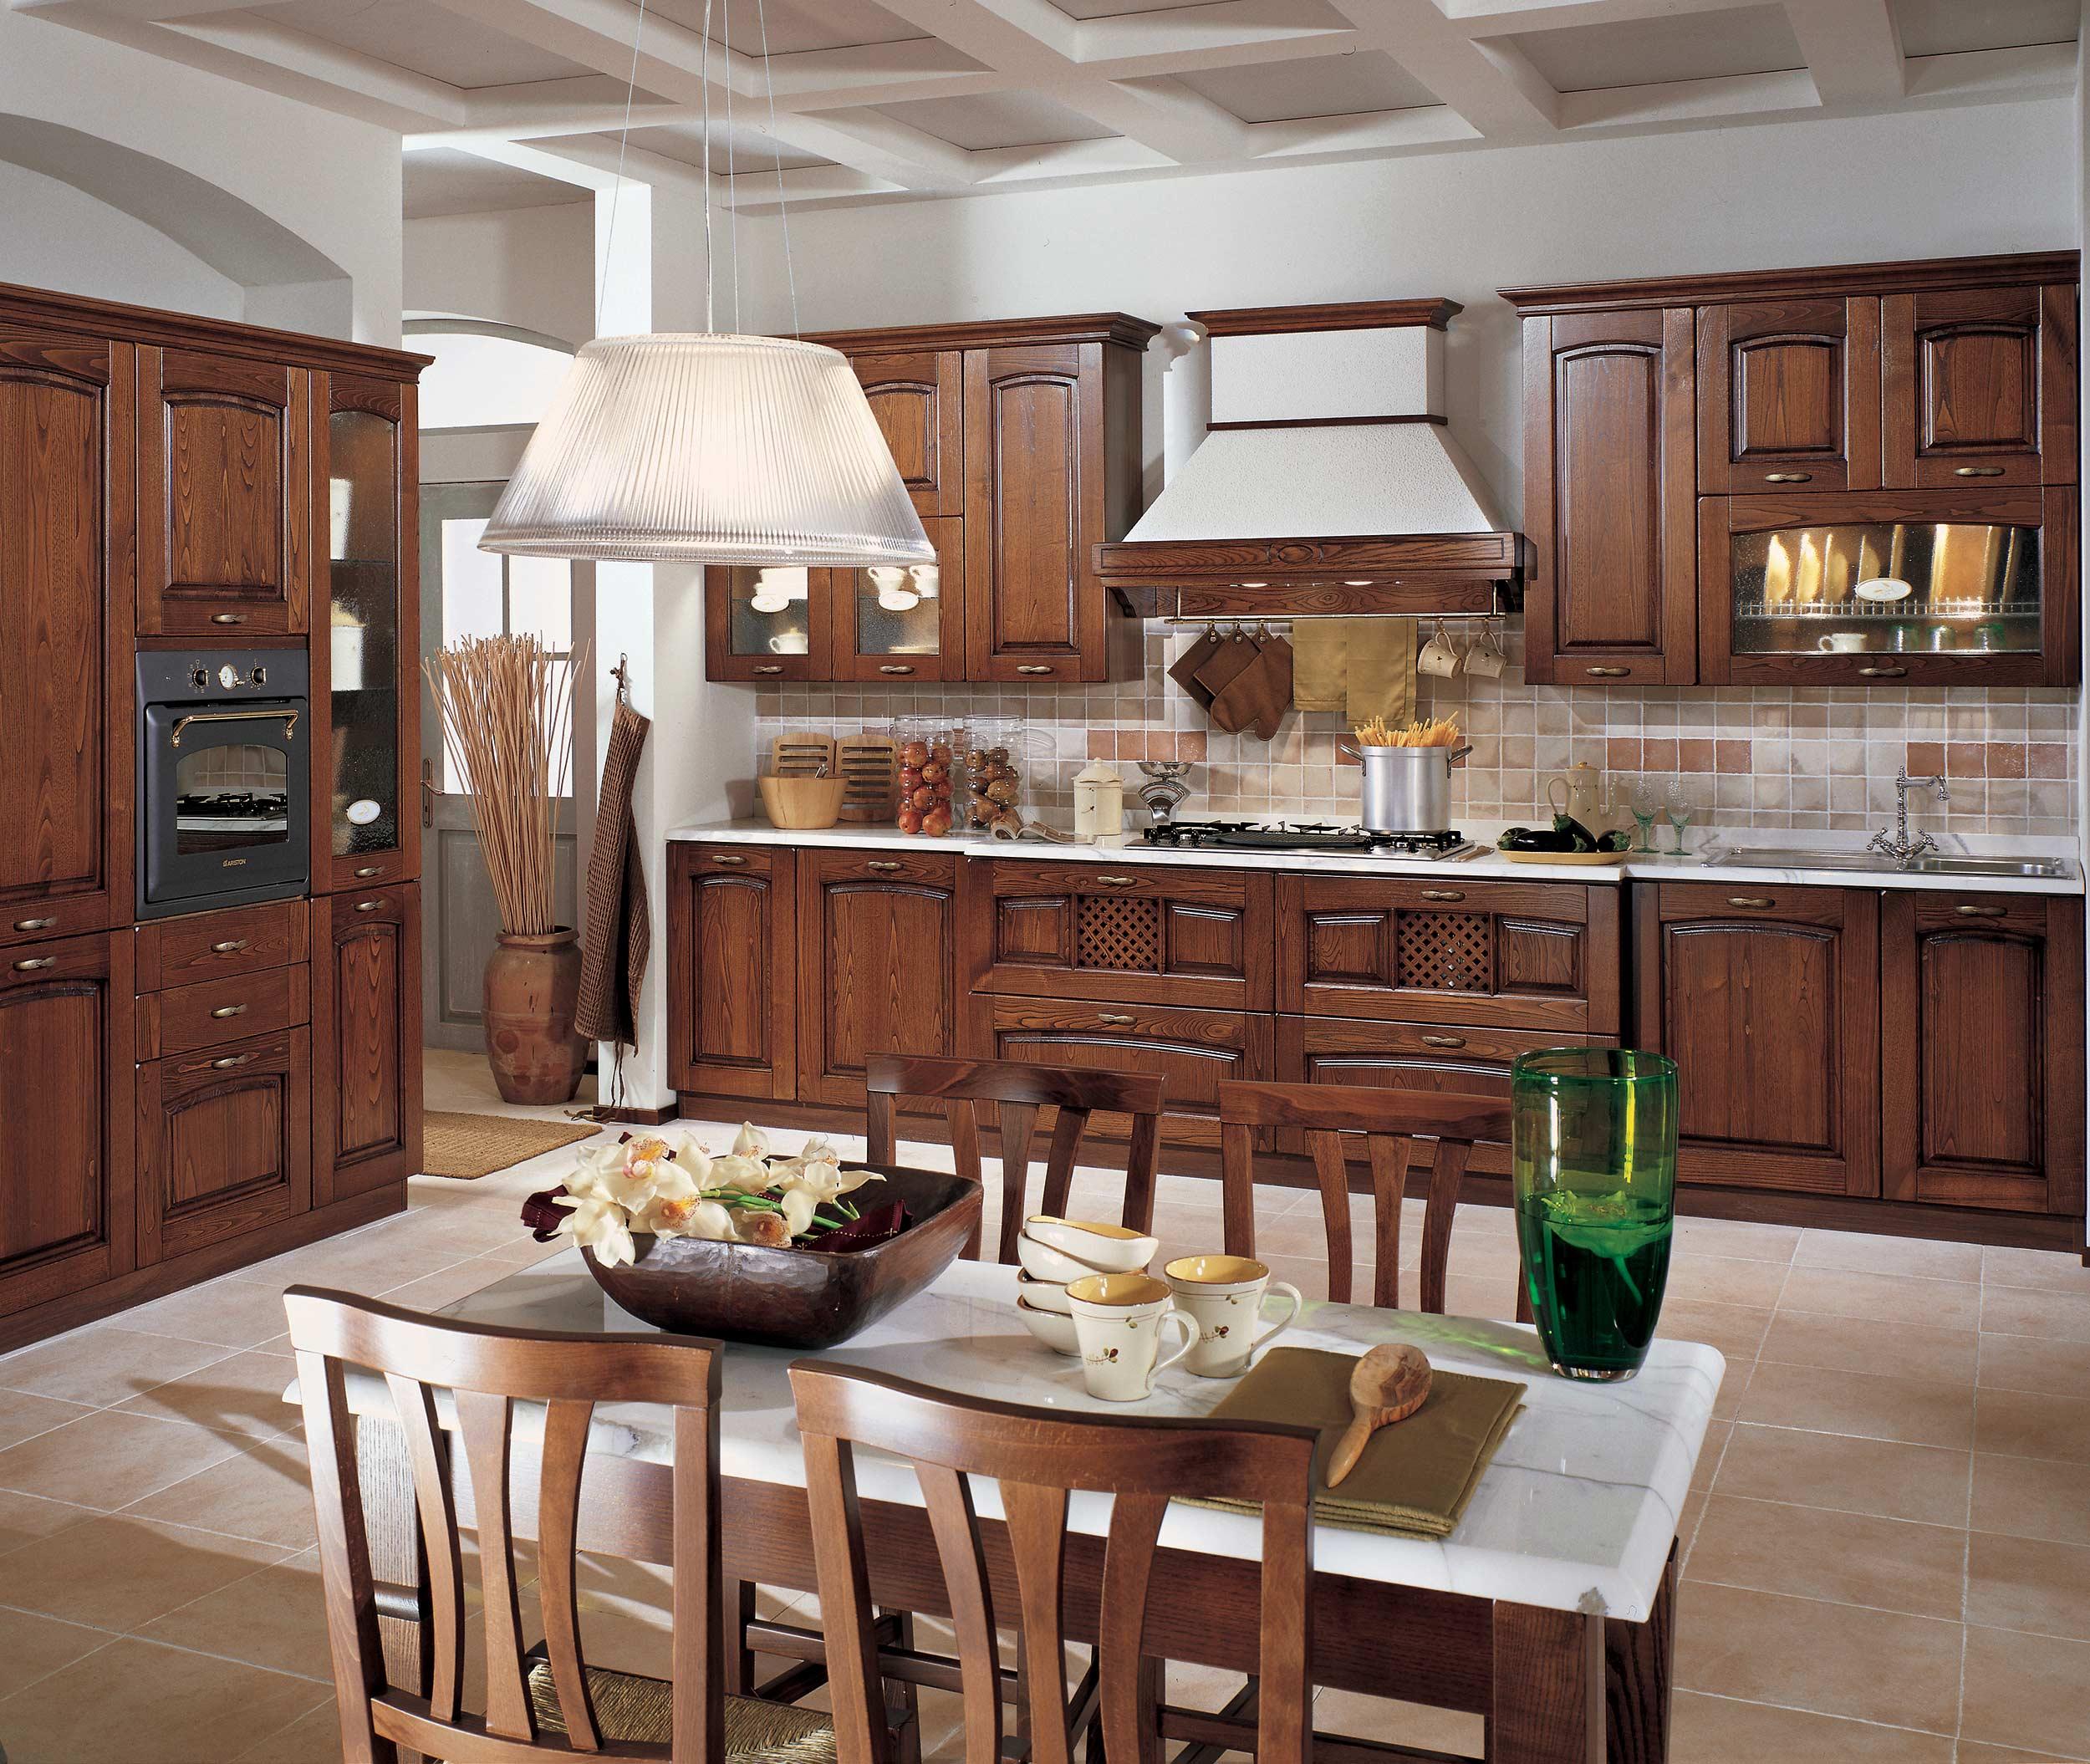 Cucina stosa focolare lorenzelli arredamenti - Cucine classiche stosa ...